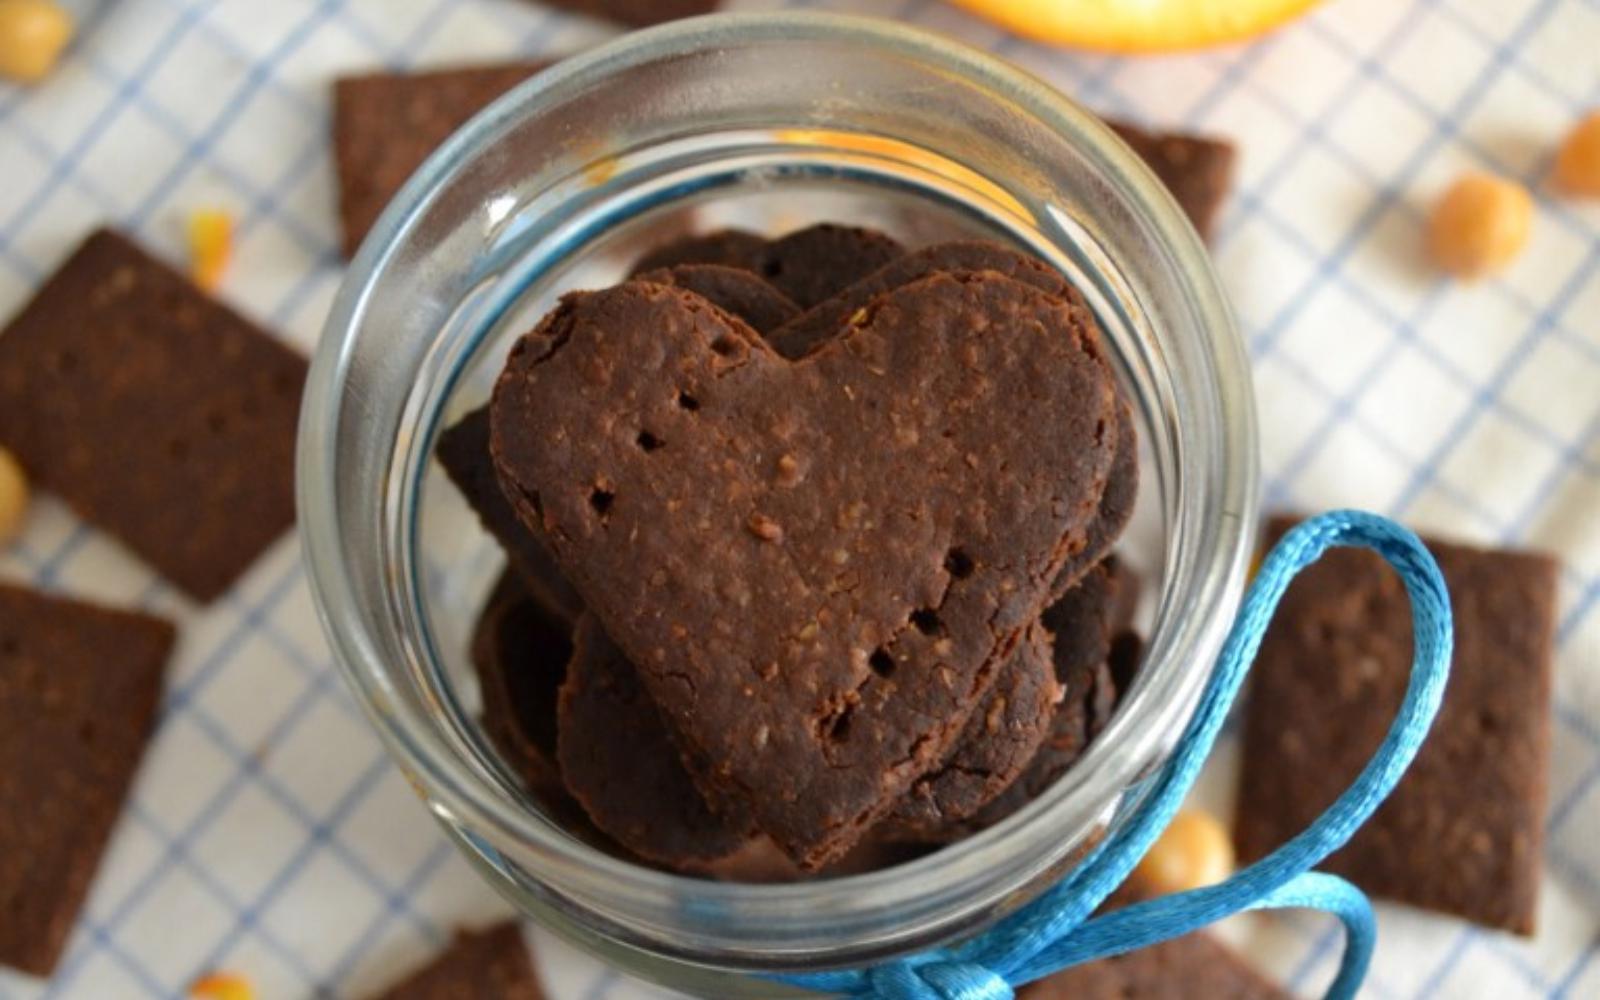 Heart-shaped chocolate orange cookies